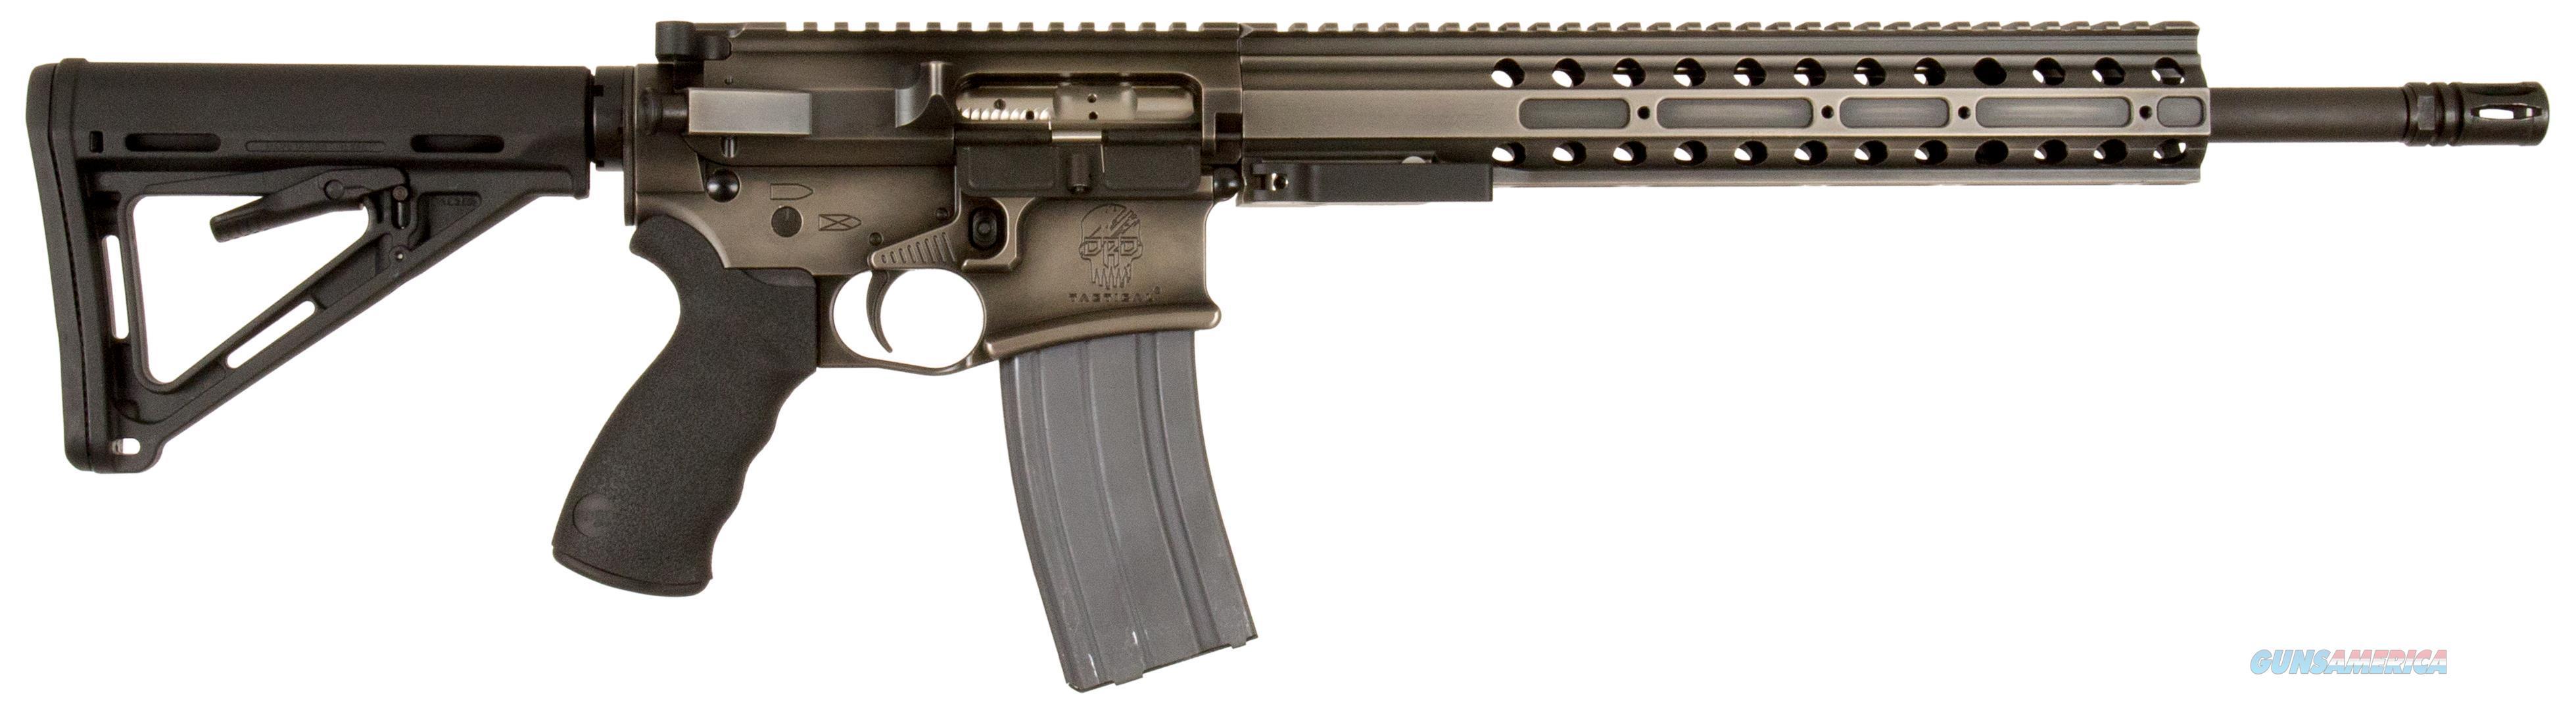 "Drd Tactical Cdr15bw556 Cdr-15 Quick Break Down Semi-Automatic 223 Remington/5.56 Nato 16"" 30+1 Magpul Moe Black Stock Battle Worn CDR15BW556  Guns > Rifles > D Misc Rifles"